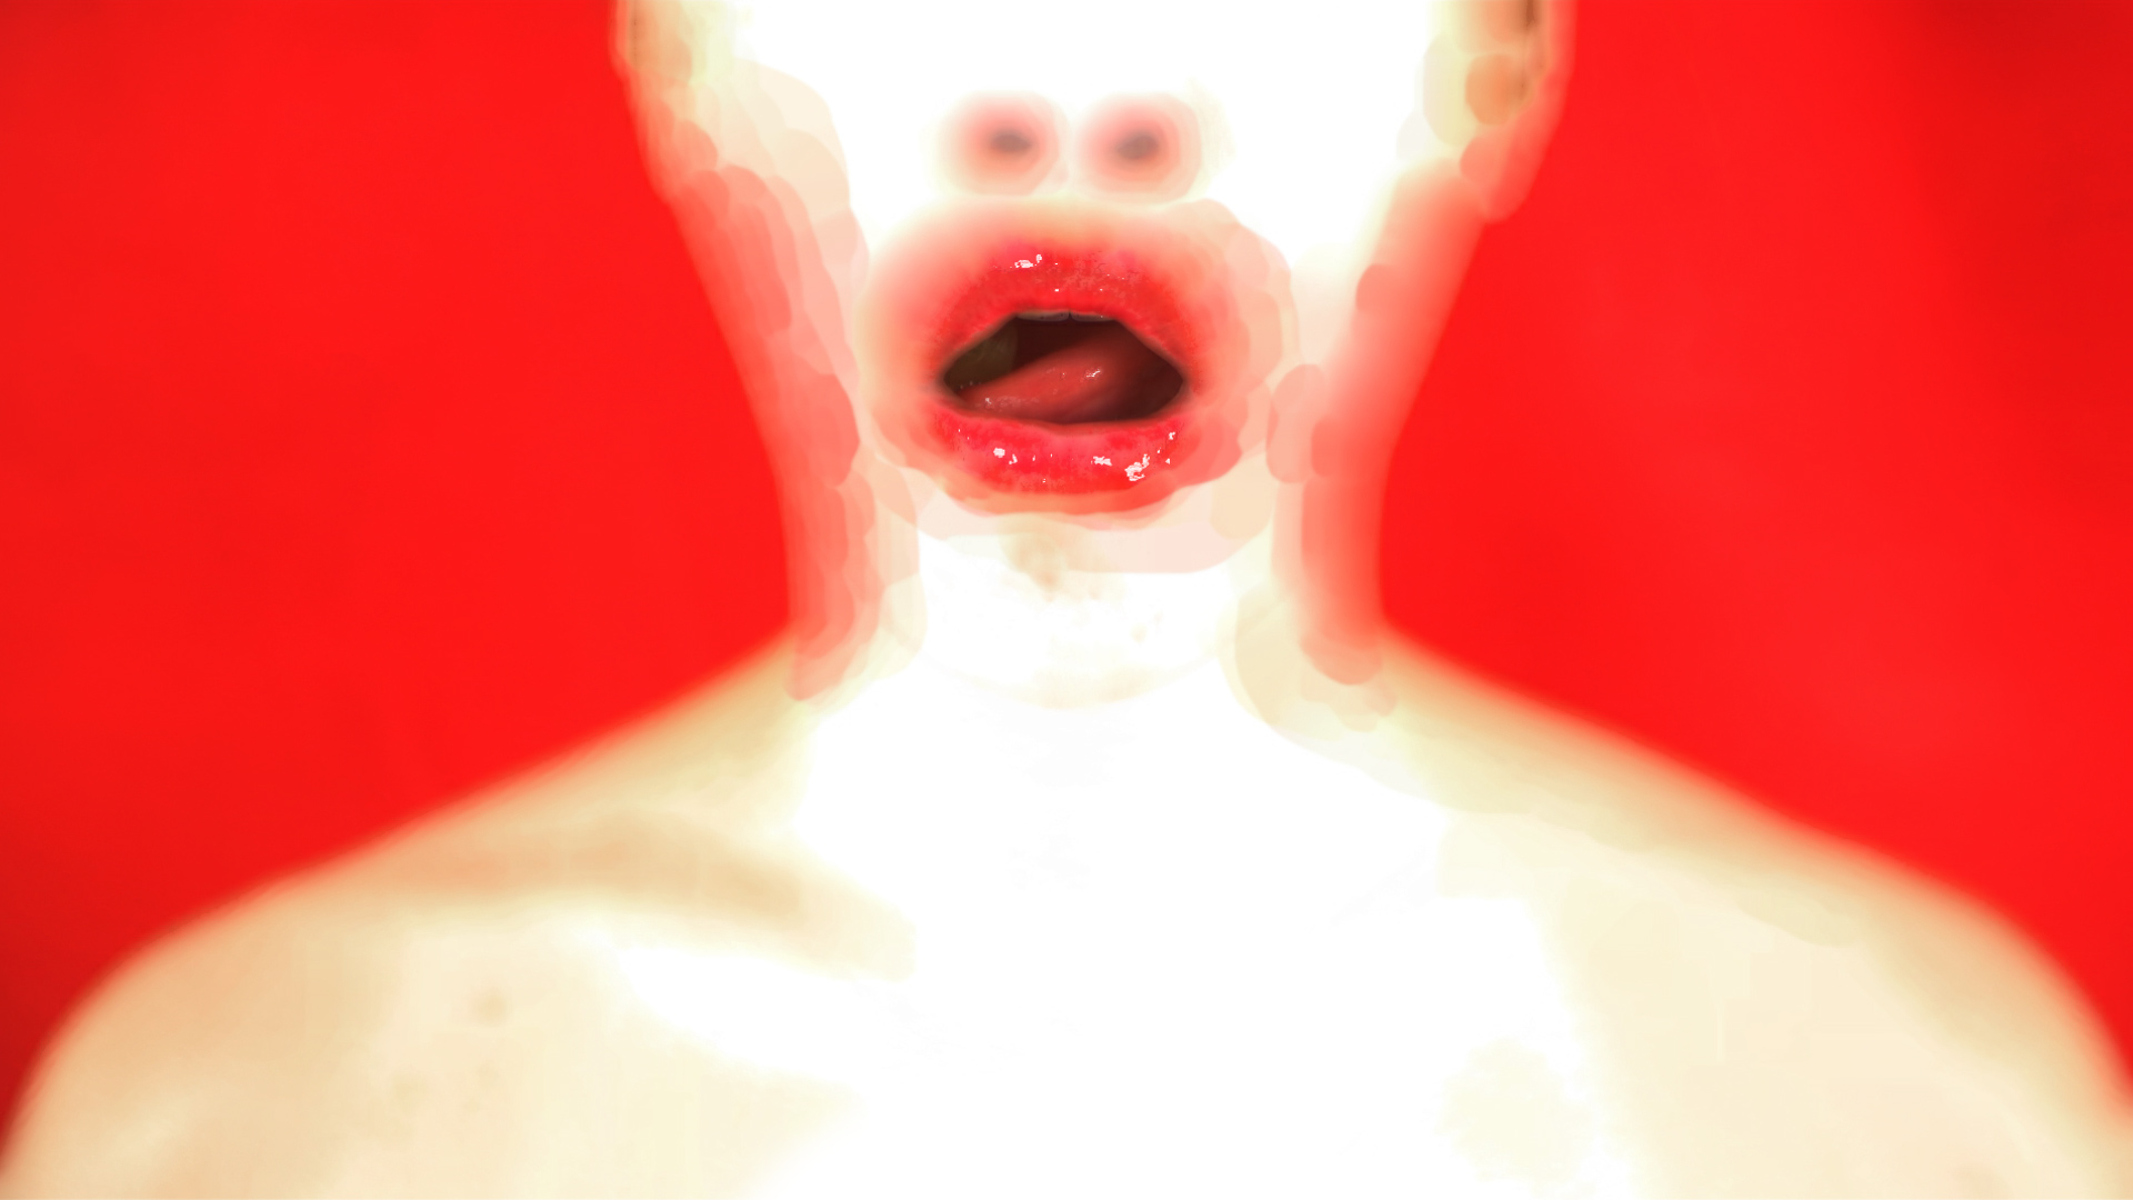 L'artiste Minha Yang rejoint la collection d'ArtJaws